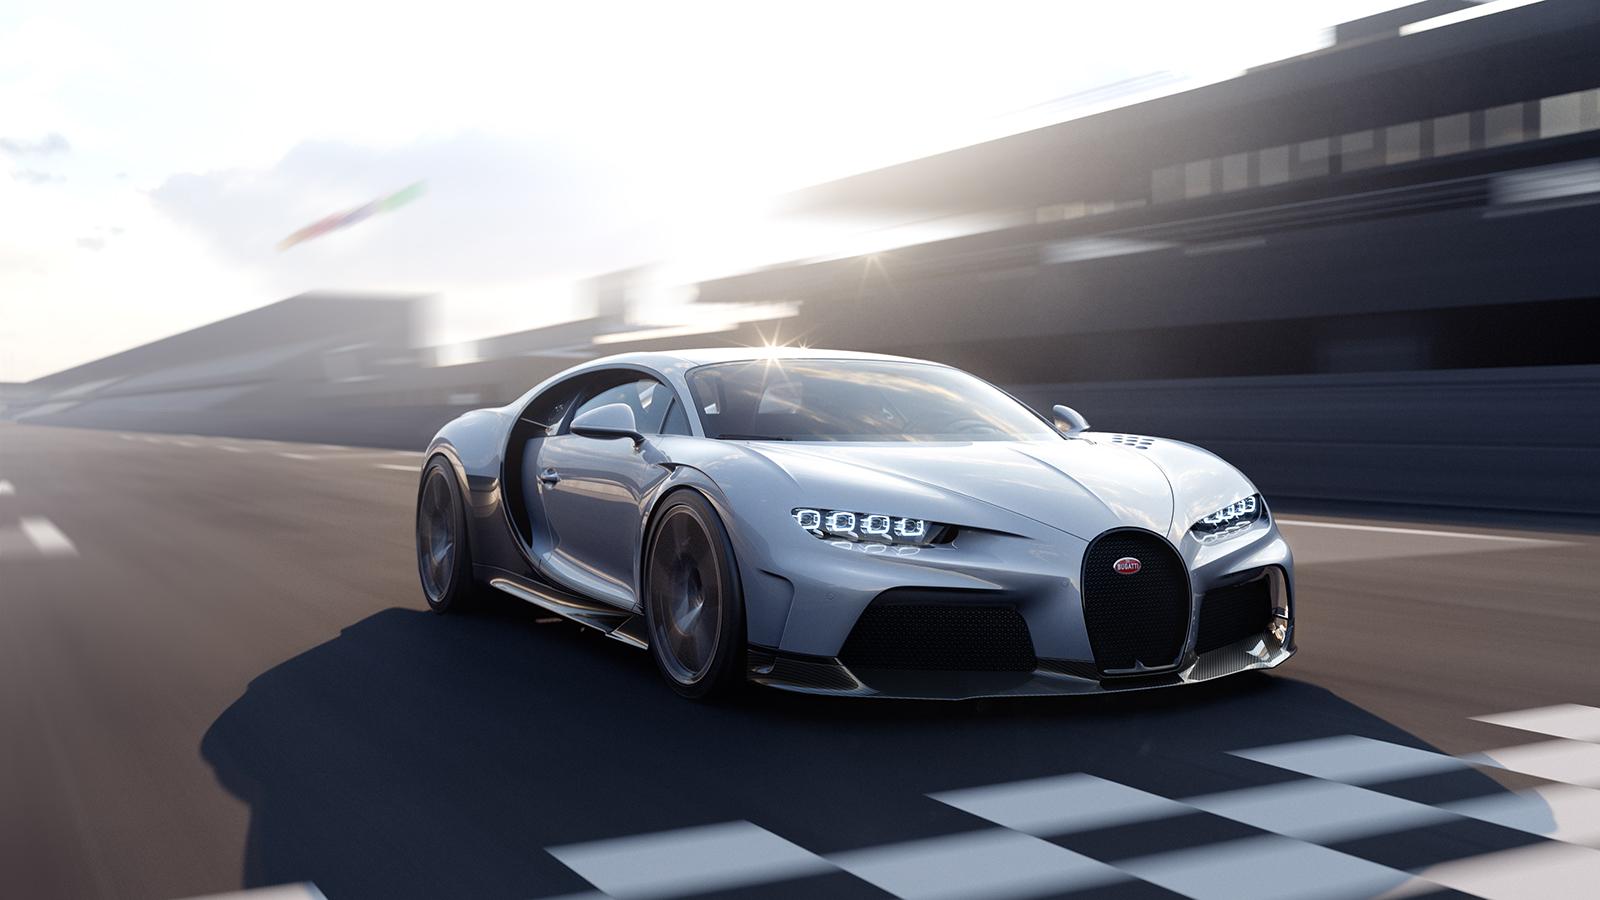 02_03_bugatti_chiron_super_sport_high_speed_front.jpeg